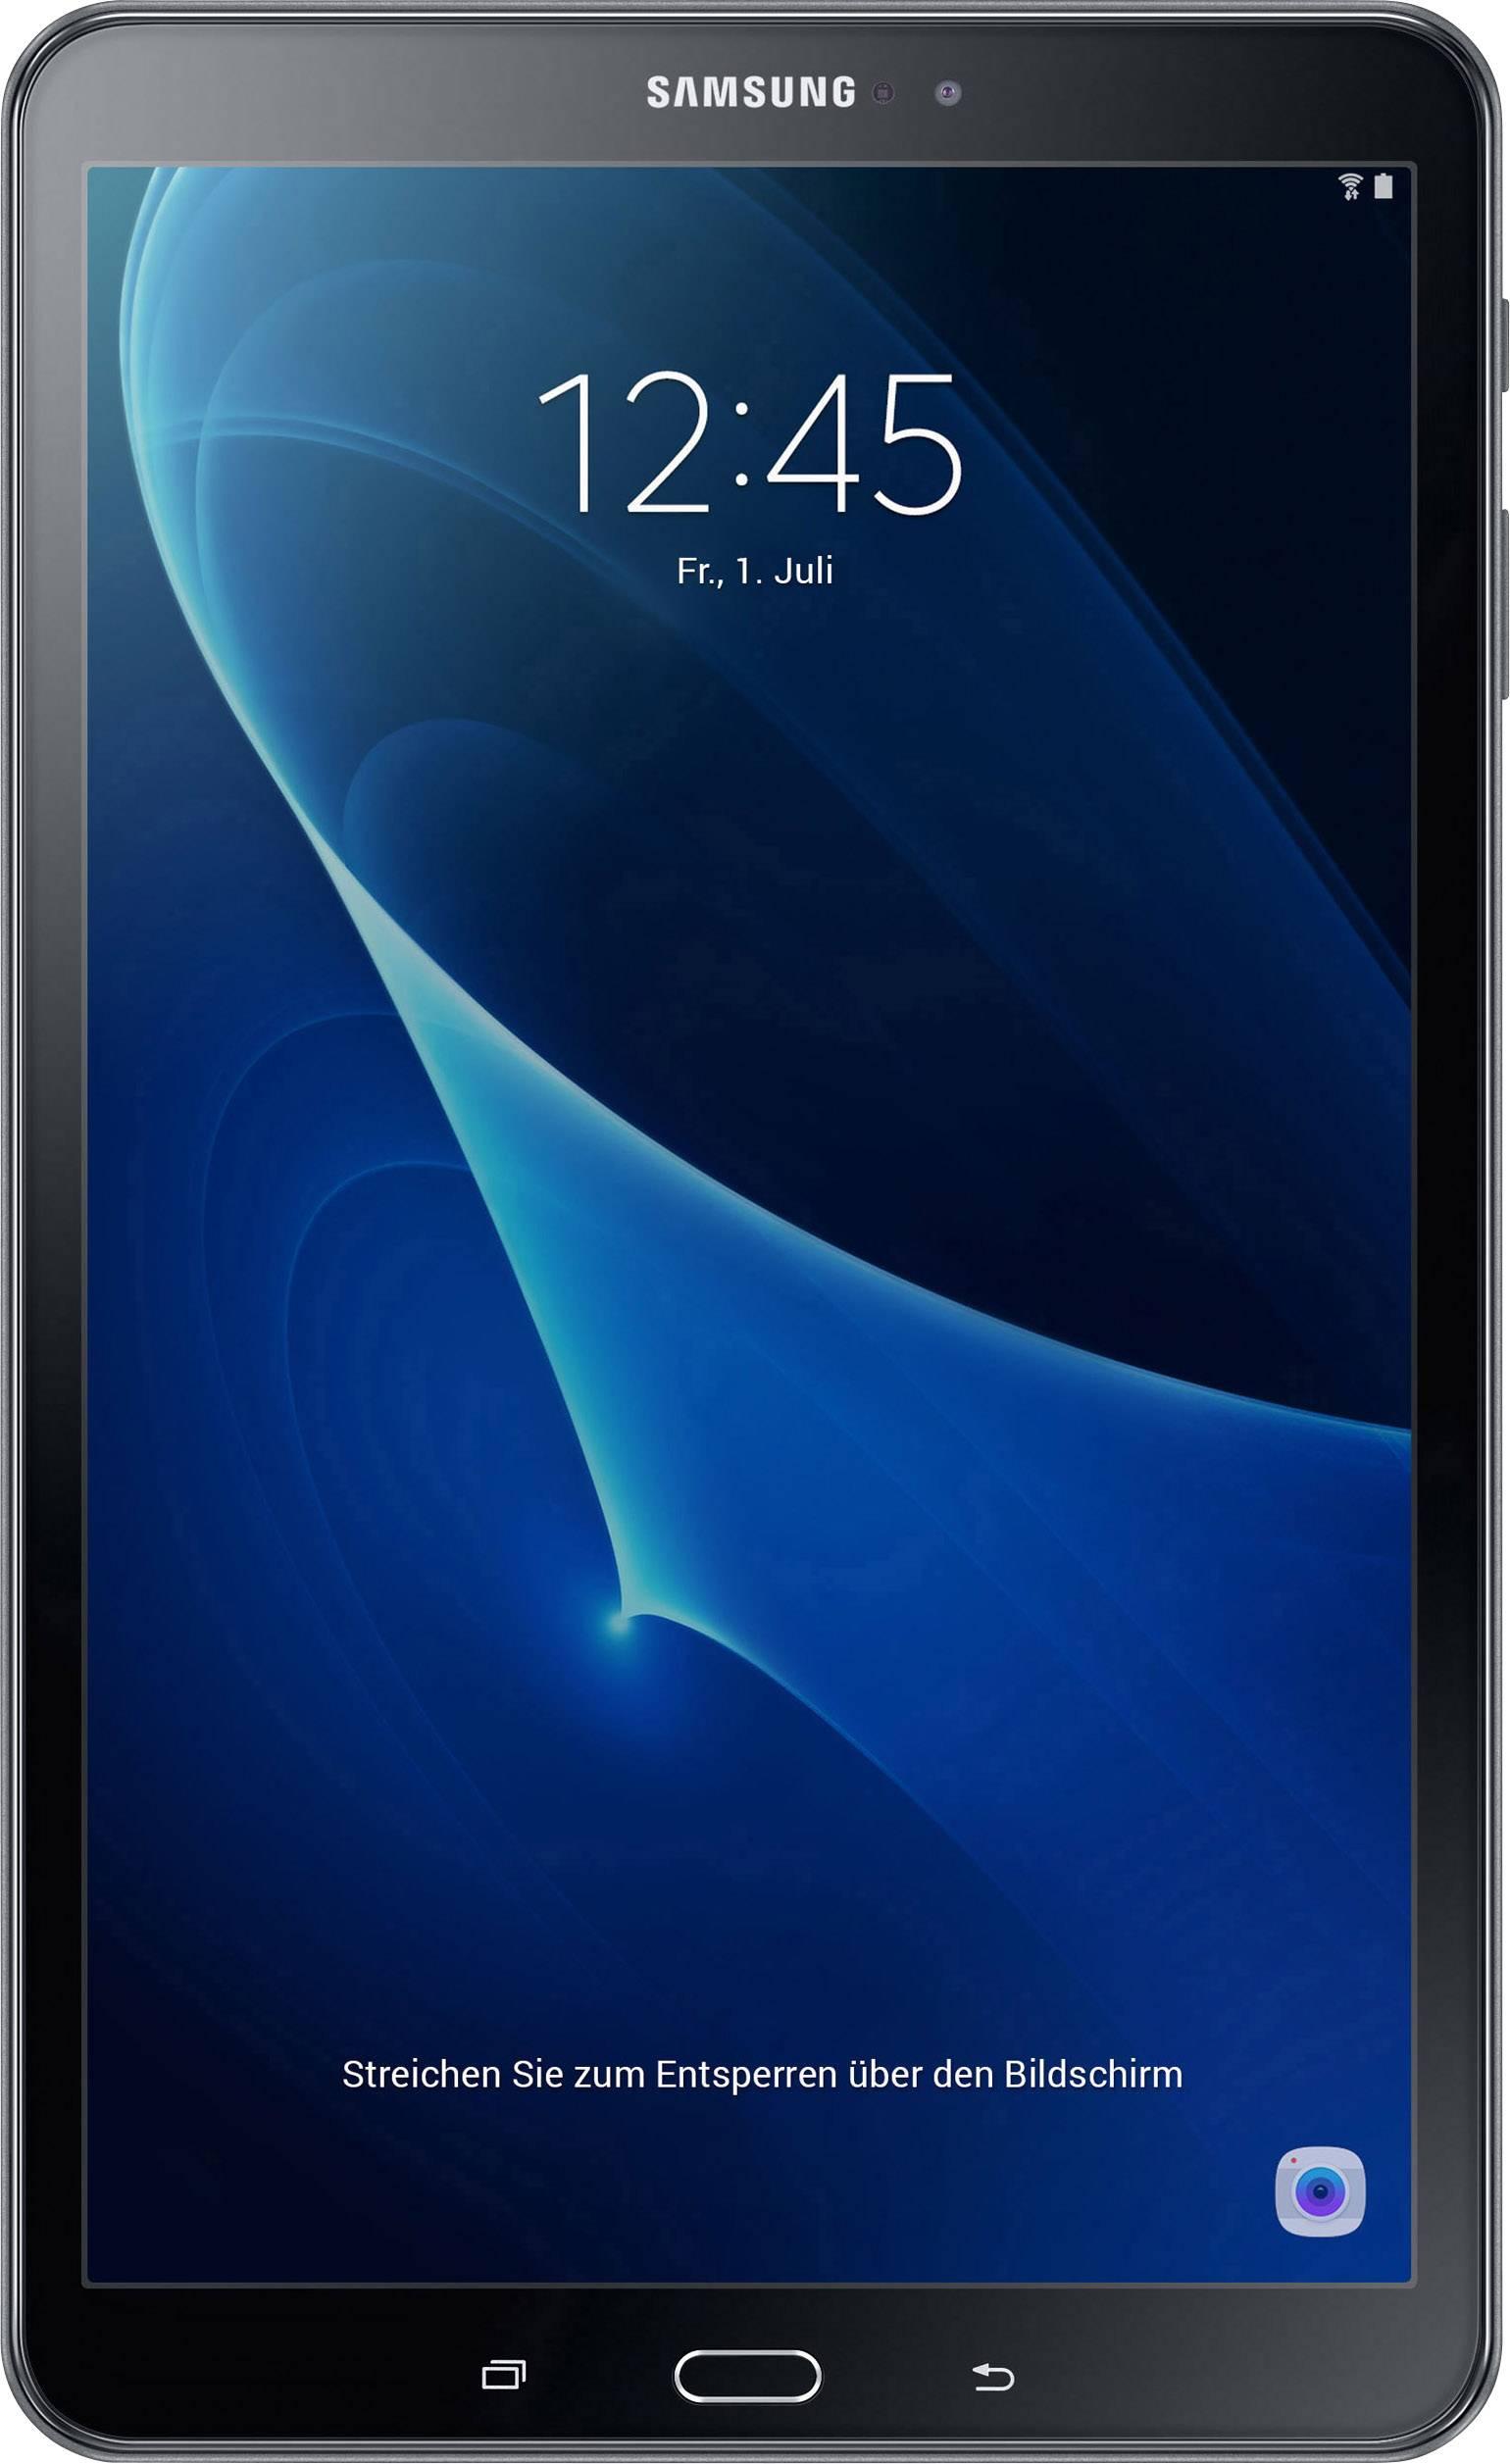 "Tablet s OS Android Samsung Galaxy Tab A 10.1 2016, 10.1 "", Octa Core 1.6 GHz, 32 GB, Wi-Fi, černá"